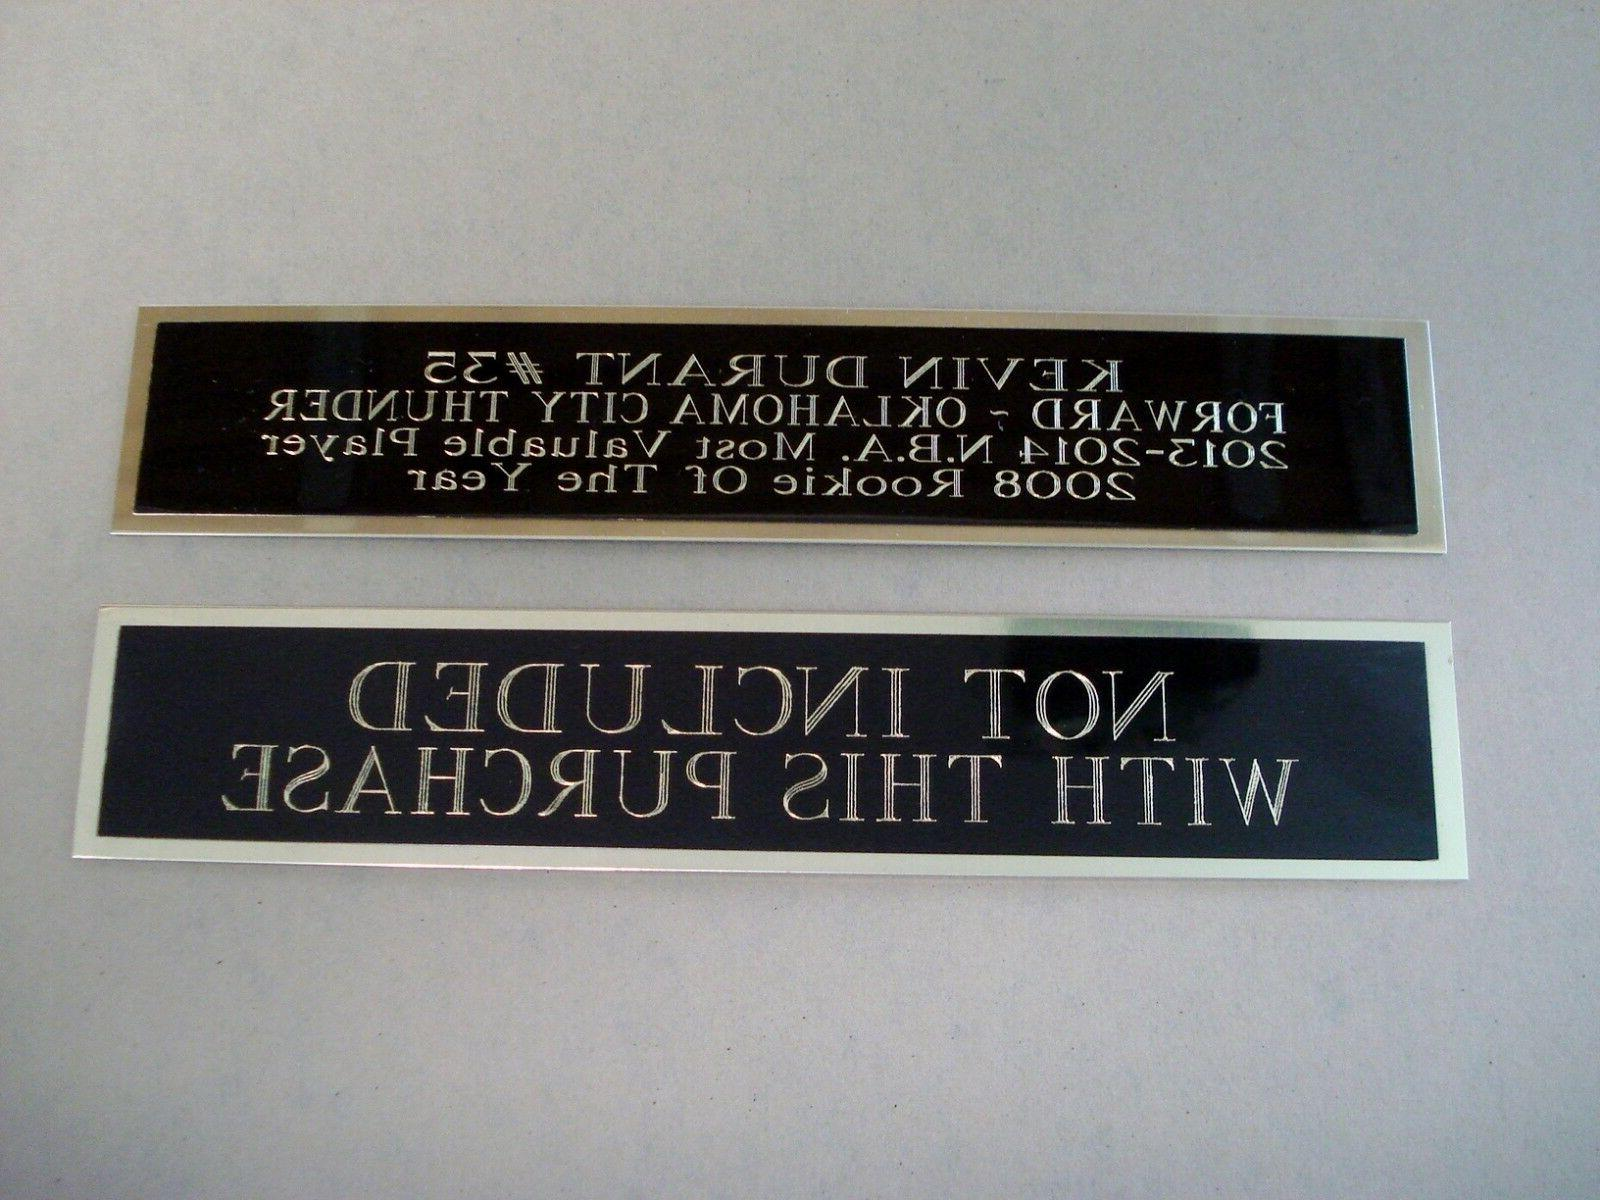 Atlanta Hawks Basketball Case W/ An Engraved Nameplate